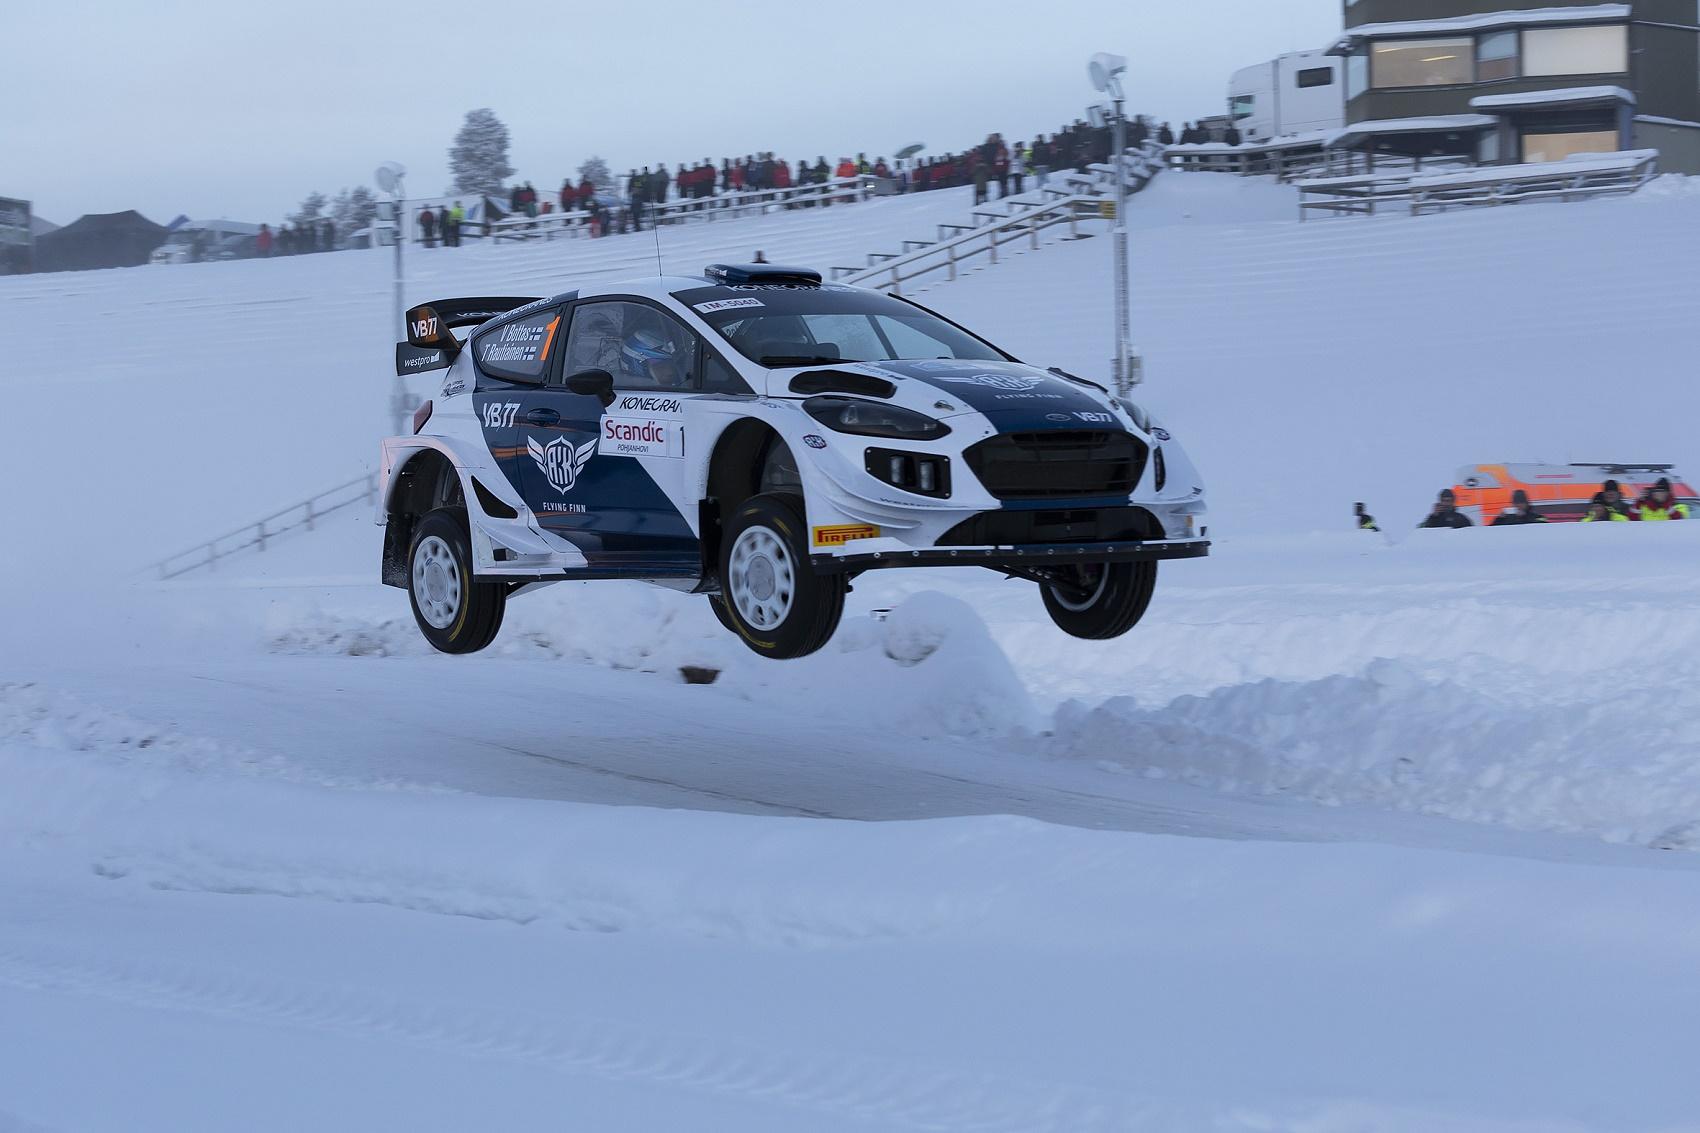 Valtteri Bottas, arctic lapland rally, racingline, racinglinehu, racingline,hu